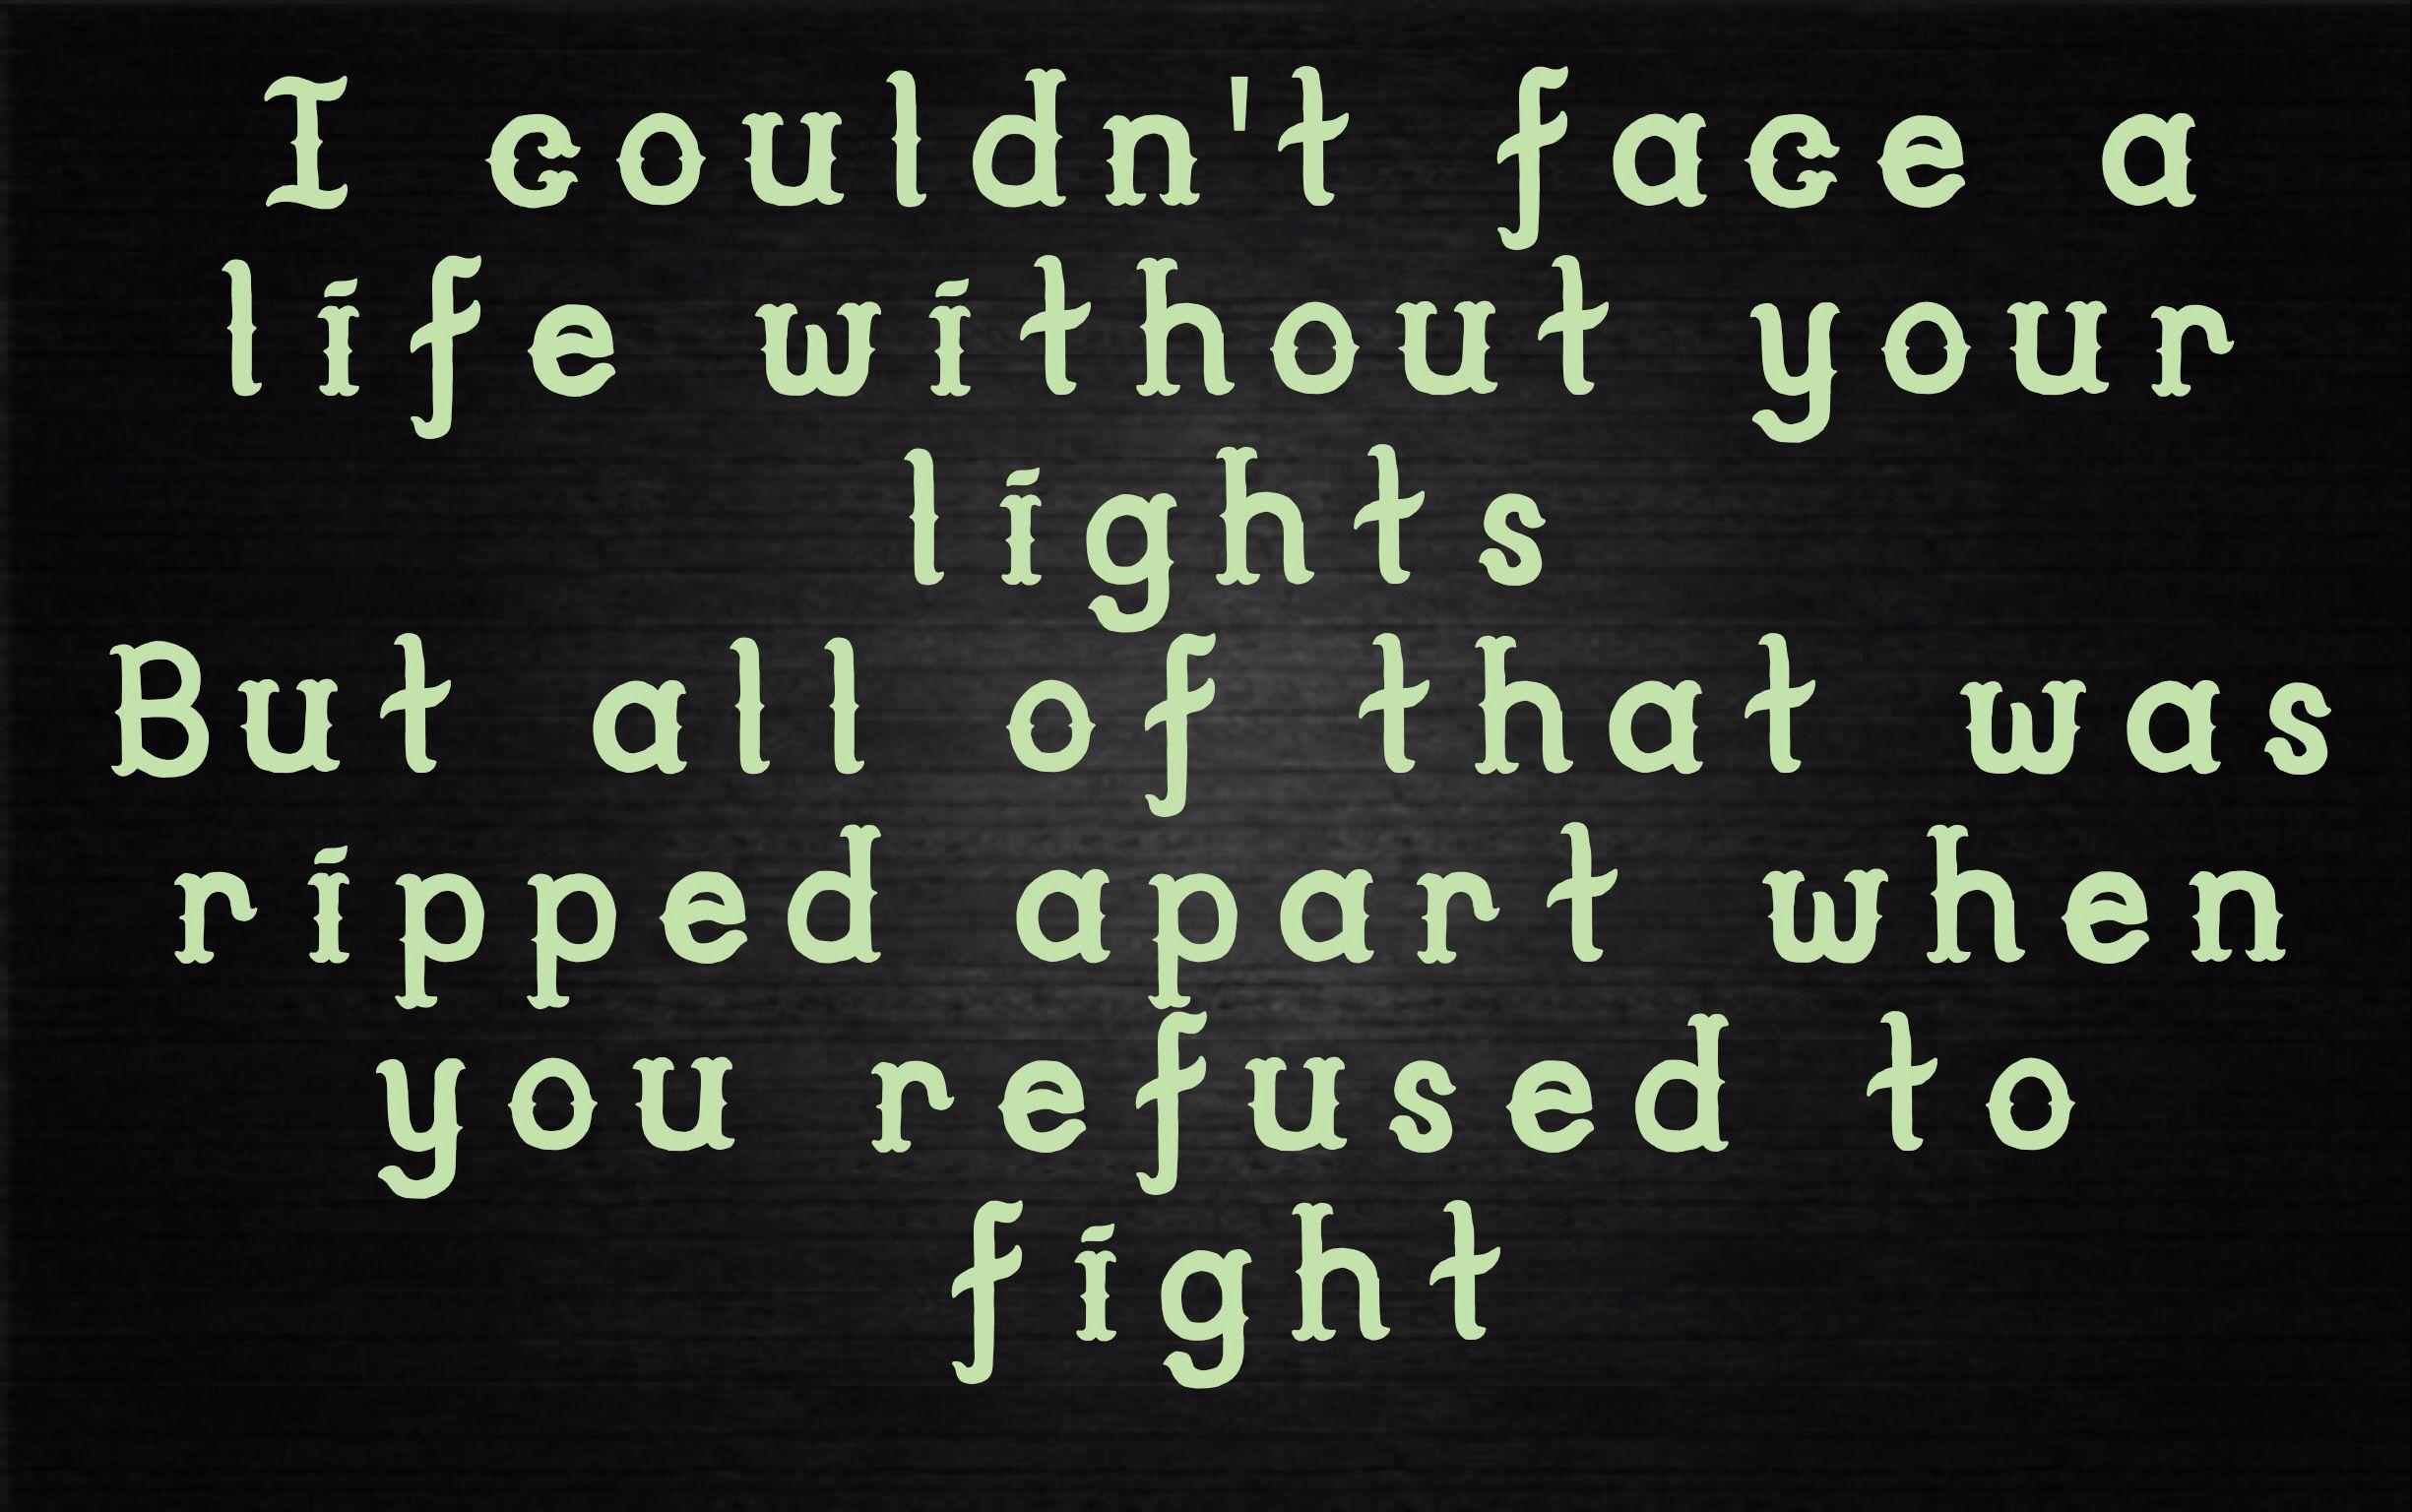 Slipknot snuff lyrics